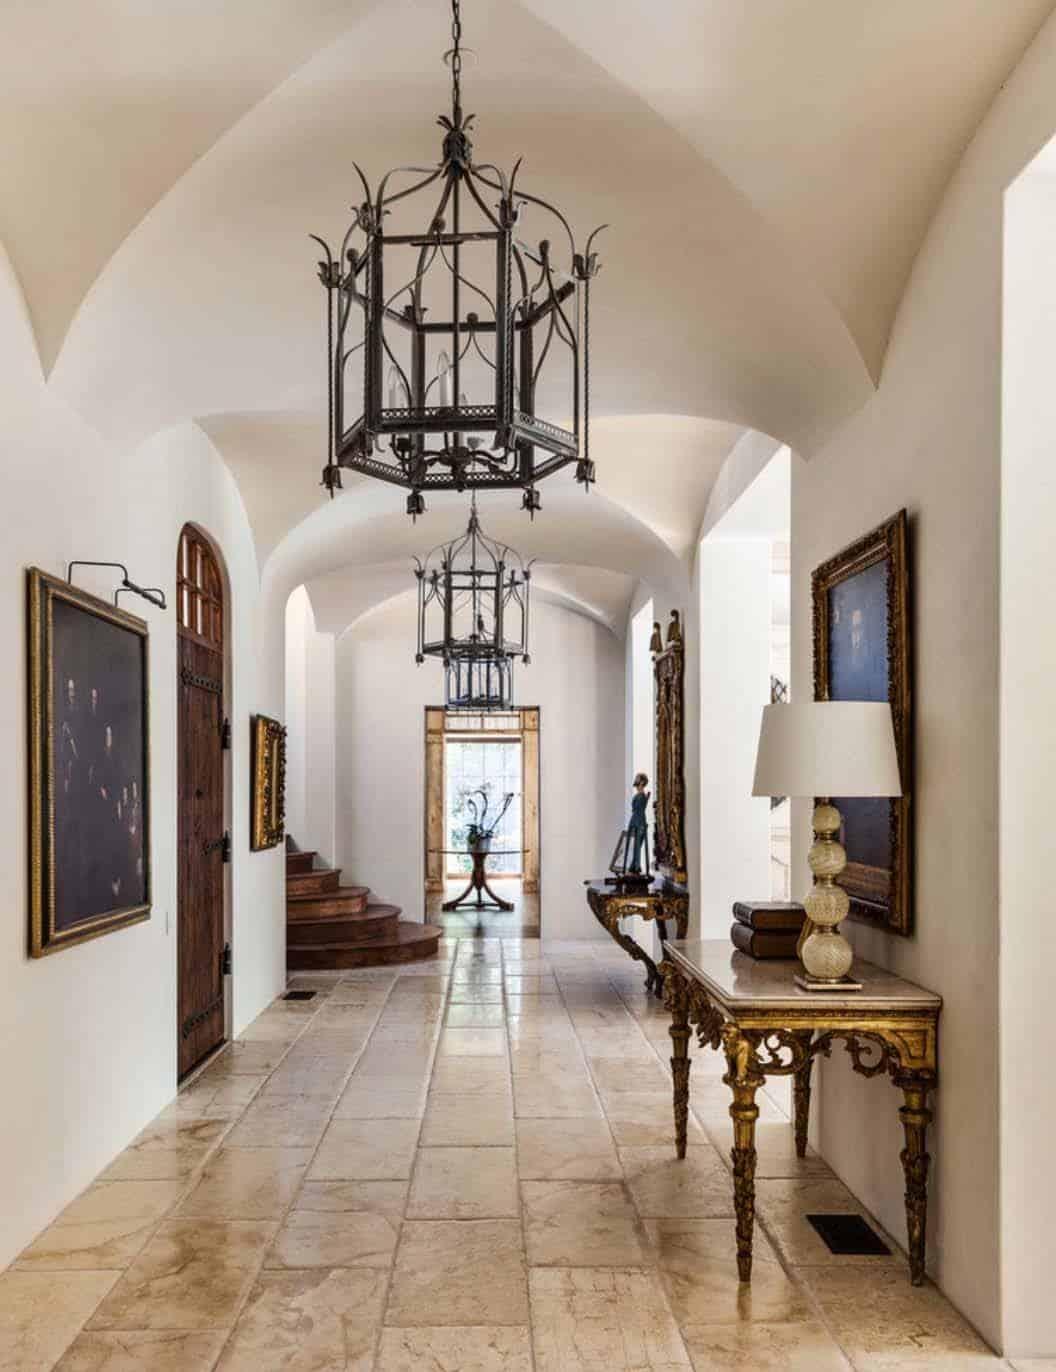 Mediterranean Style Residence-Stocker Hoesterey Montenegro-07-1 Kindesign